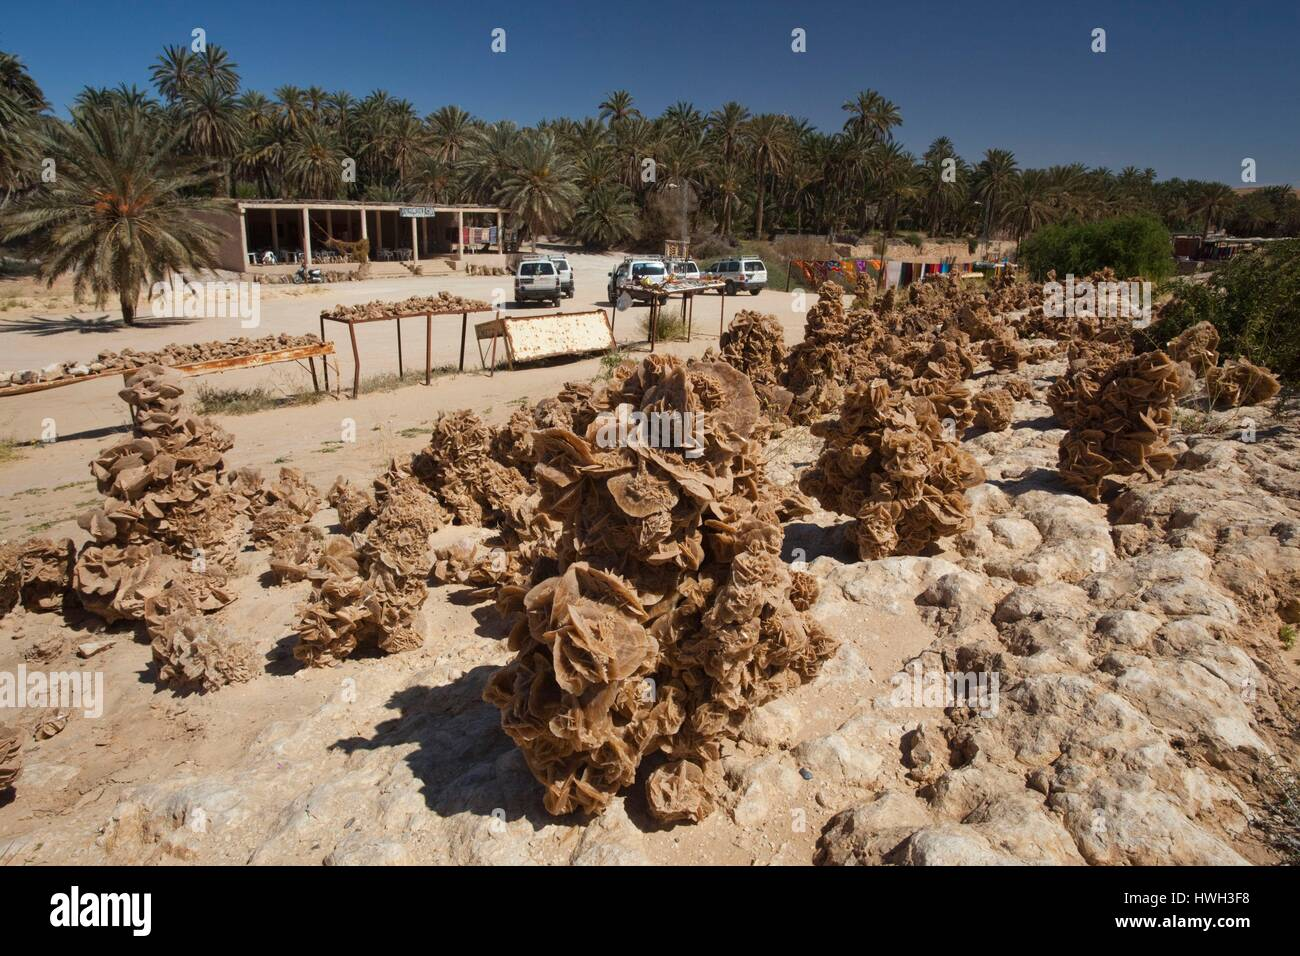 Túnez, la zona Jerid, Gargantas de Selja, mides, souvenir Desert Rose rocas Foto de stock